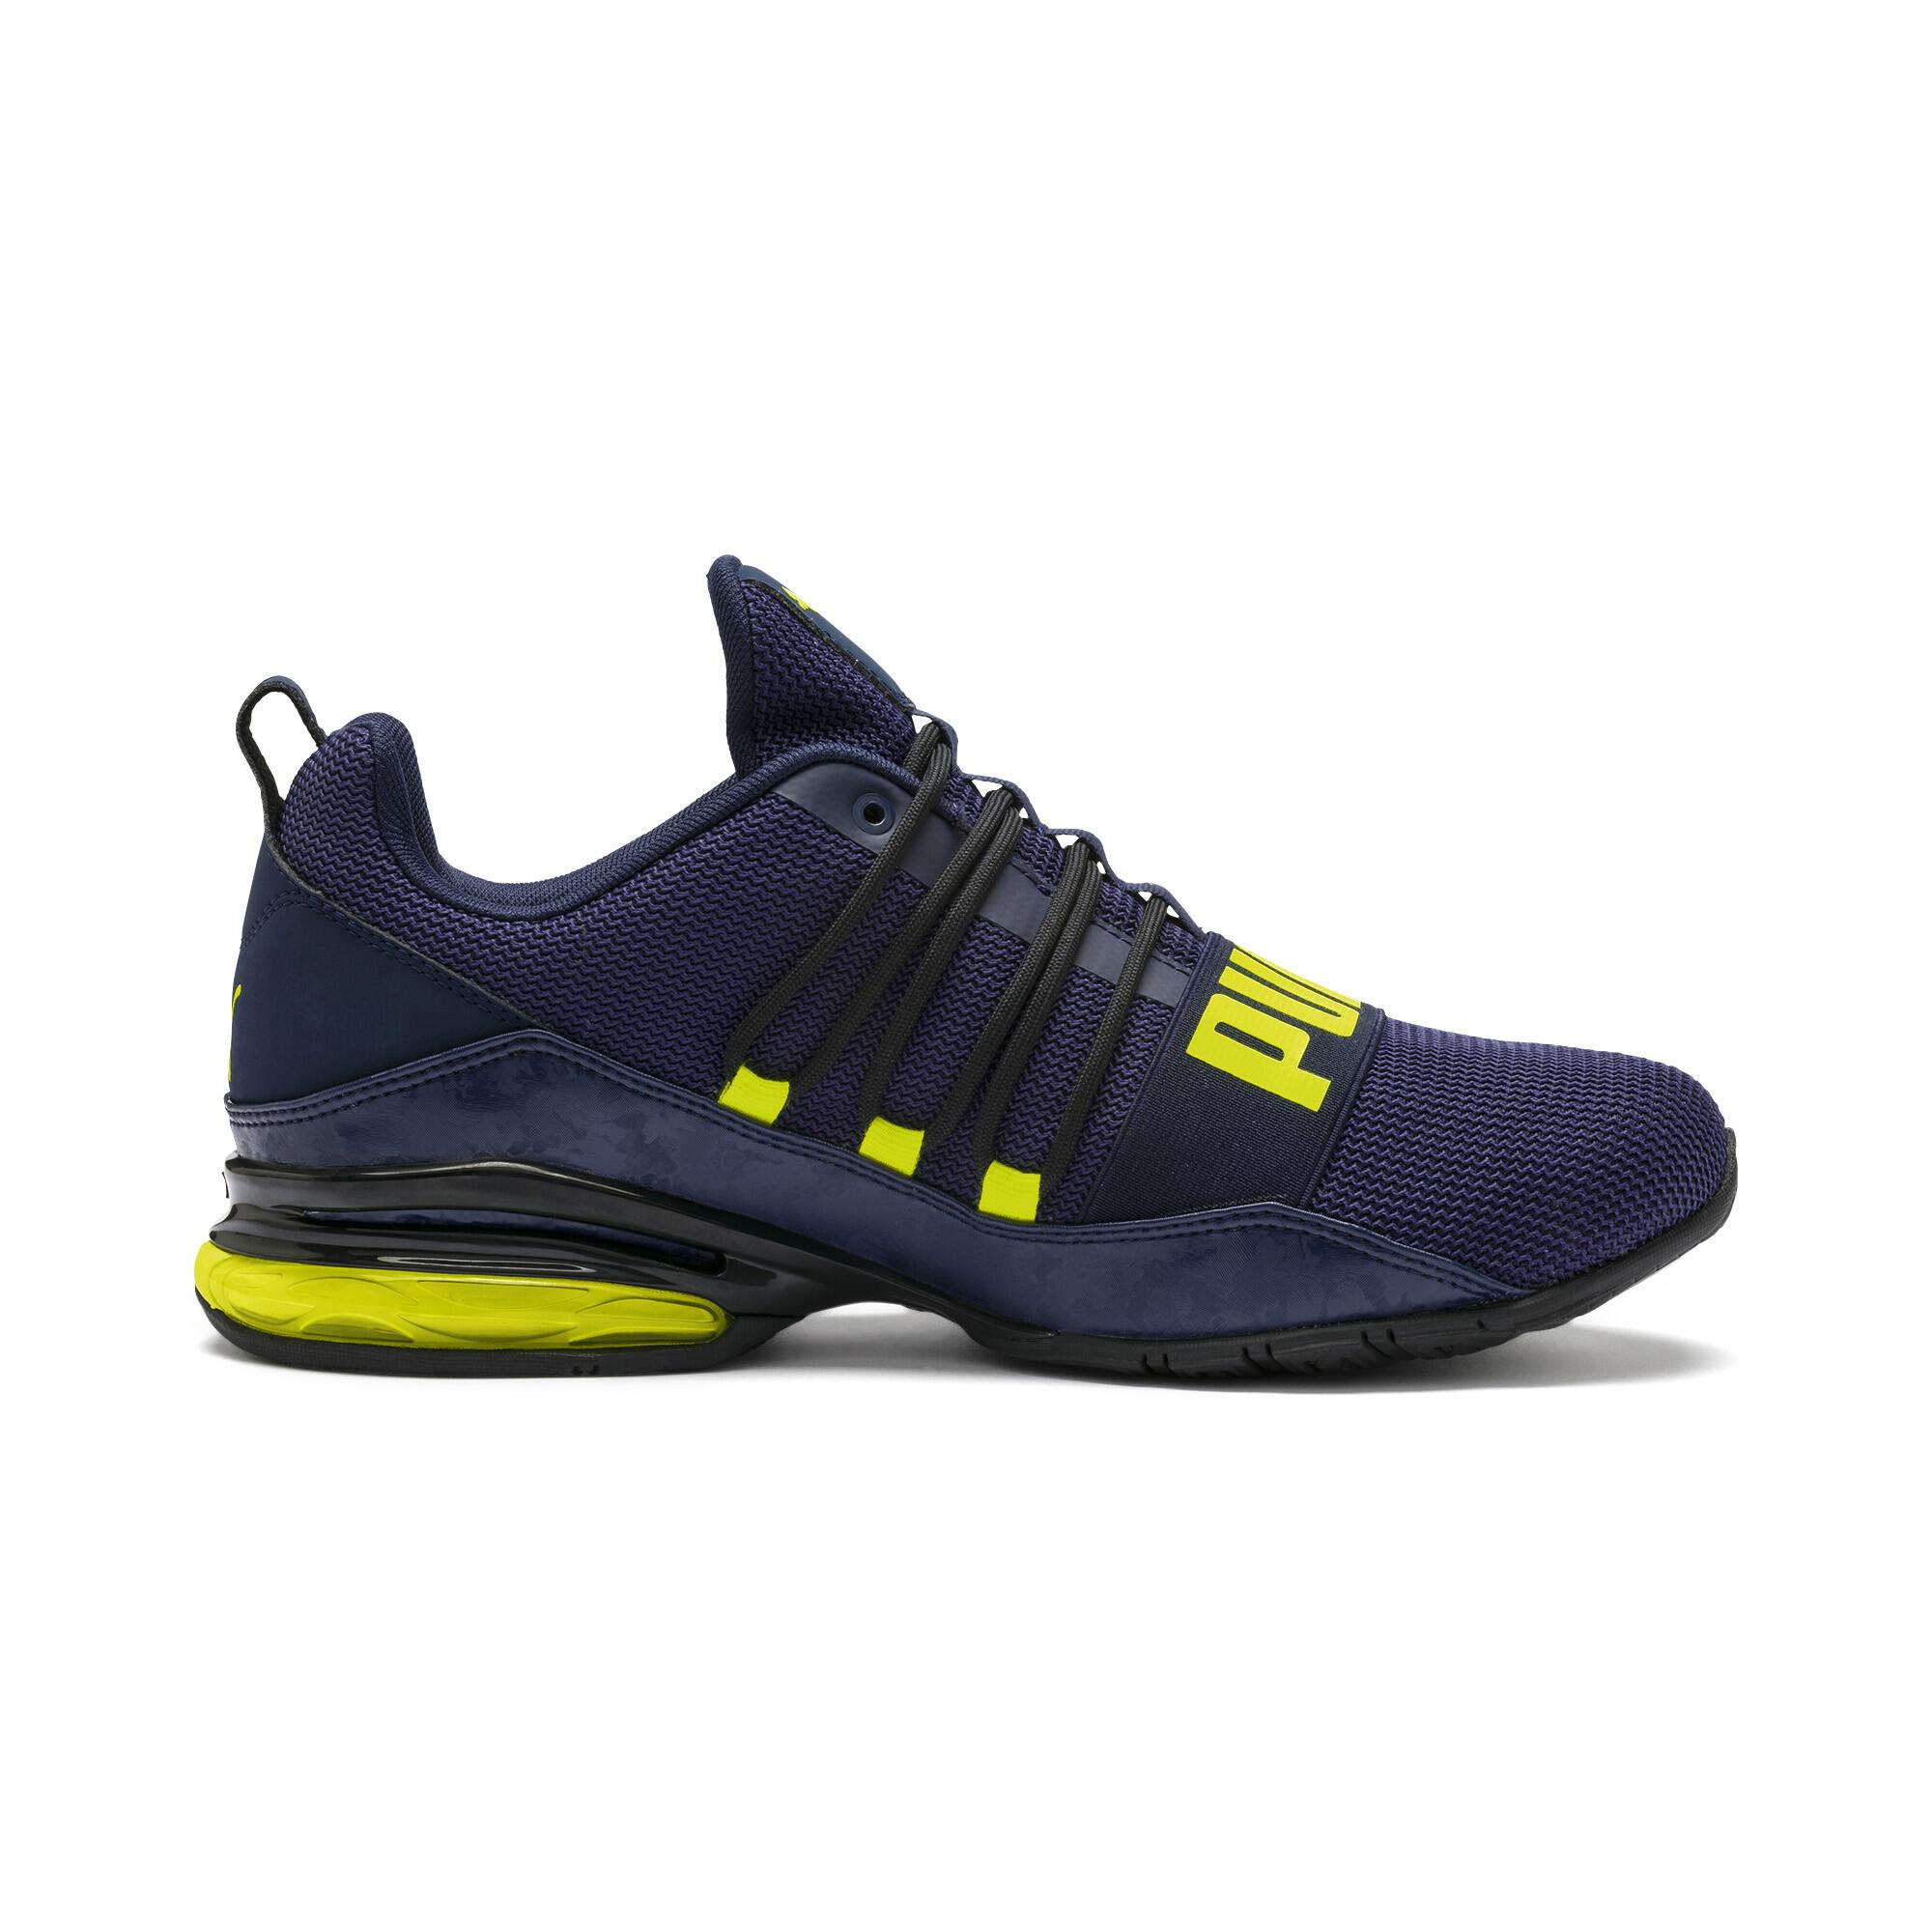 PUMA-CELL-Regulate-Camo-Men-s-Training-Shoes-Men-Shoe-Running thumbnail 14